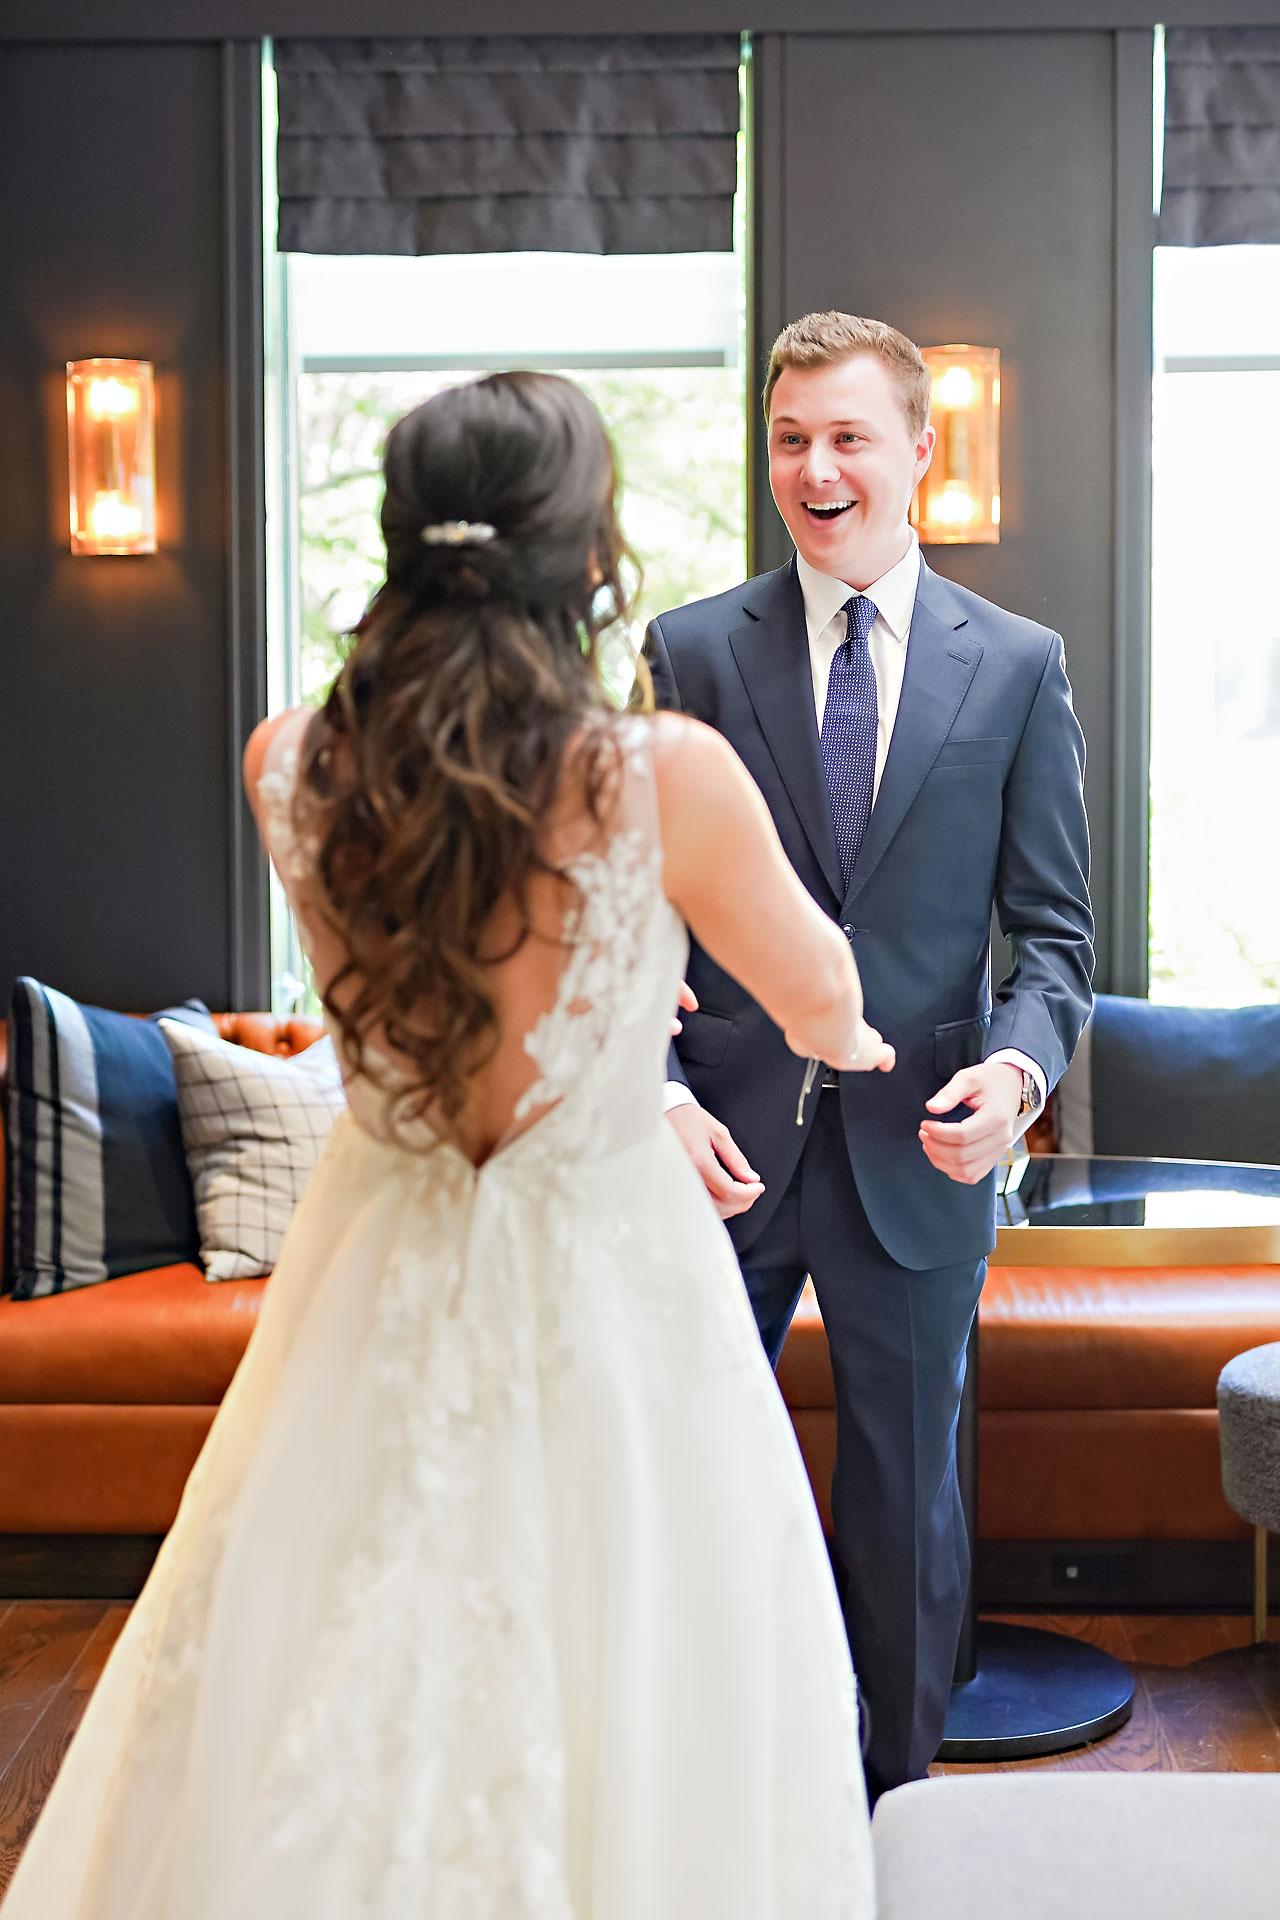 MacKinze John Lafayette Indiana Purdue Wedding 046